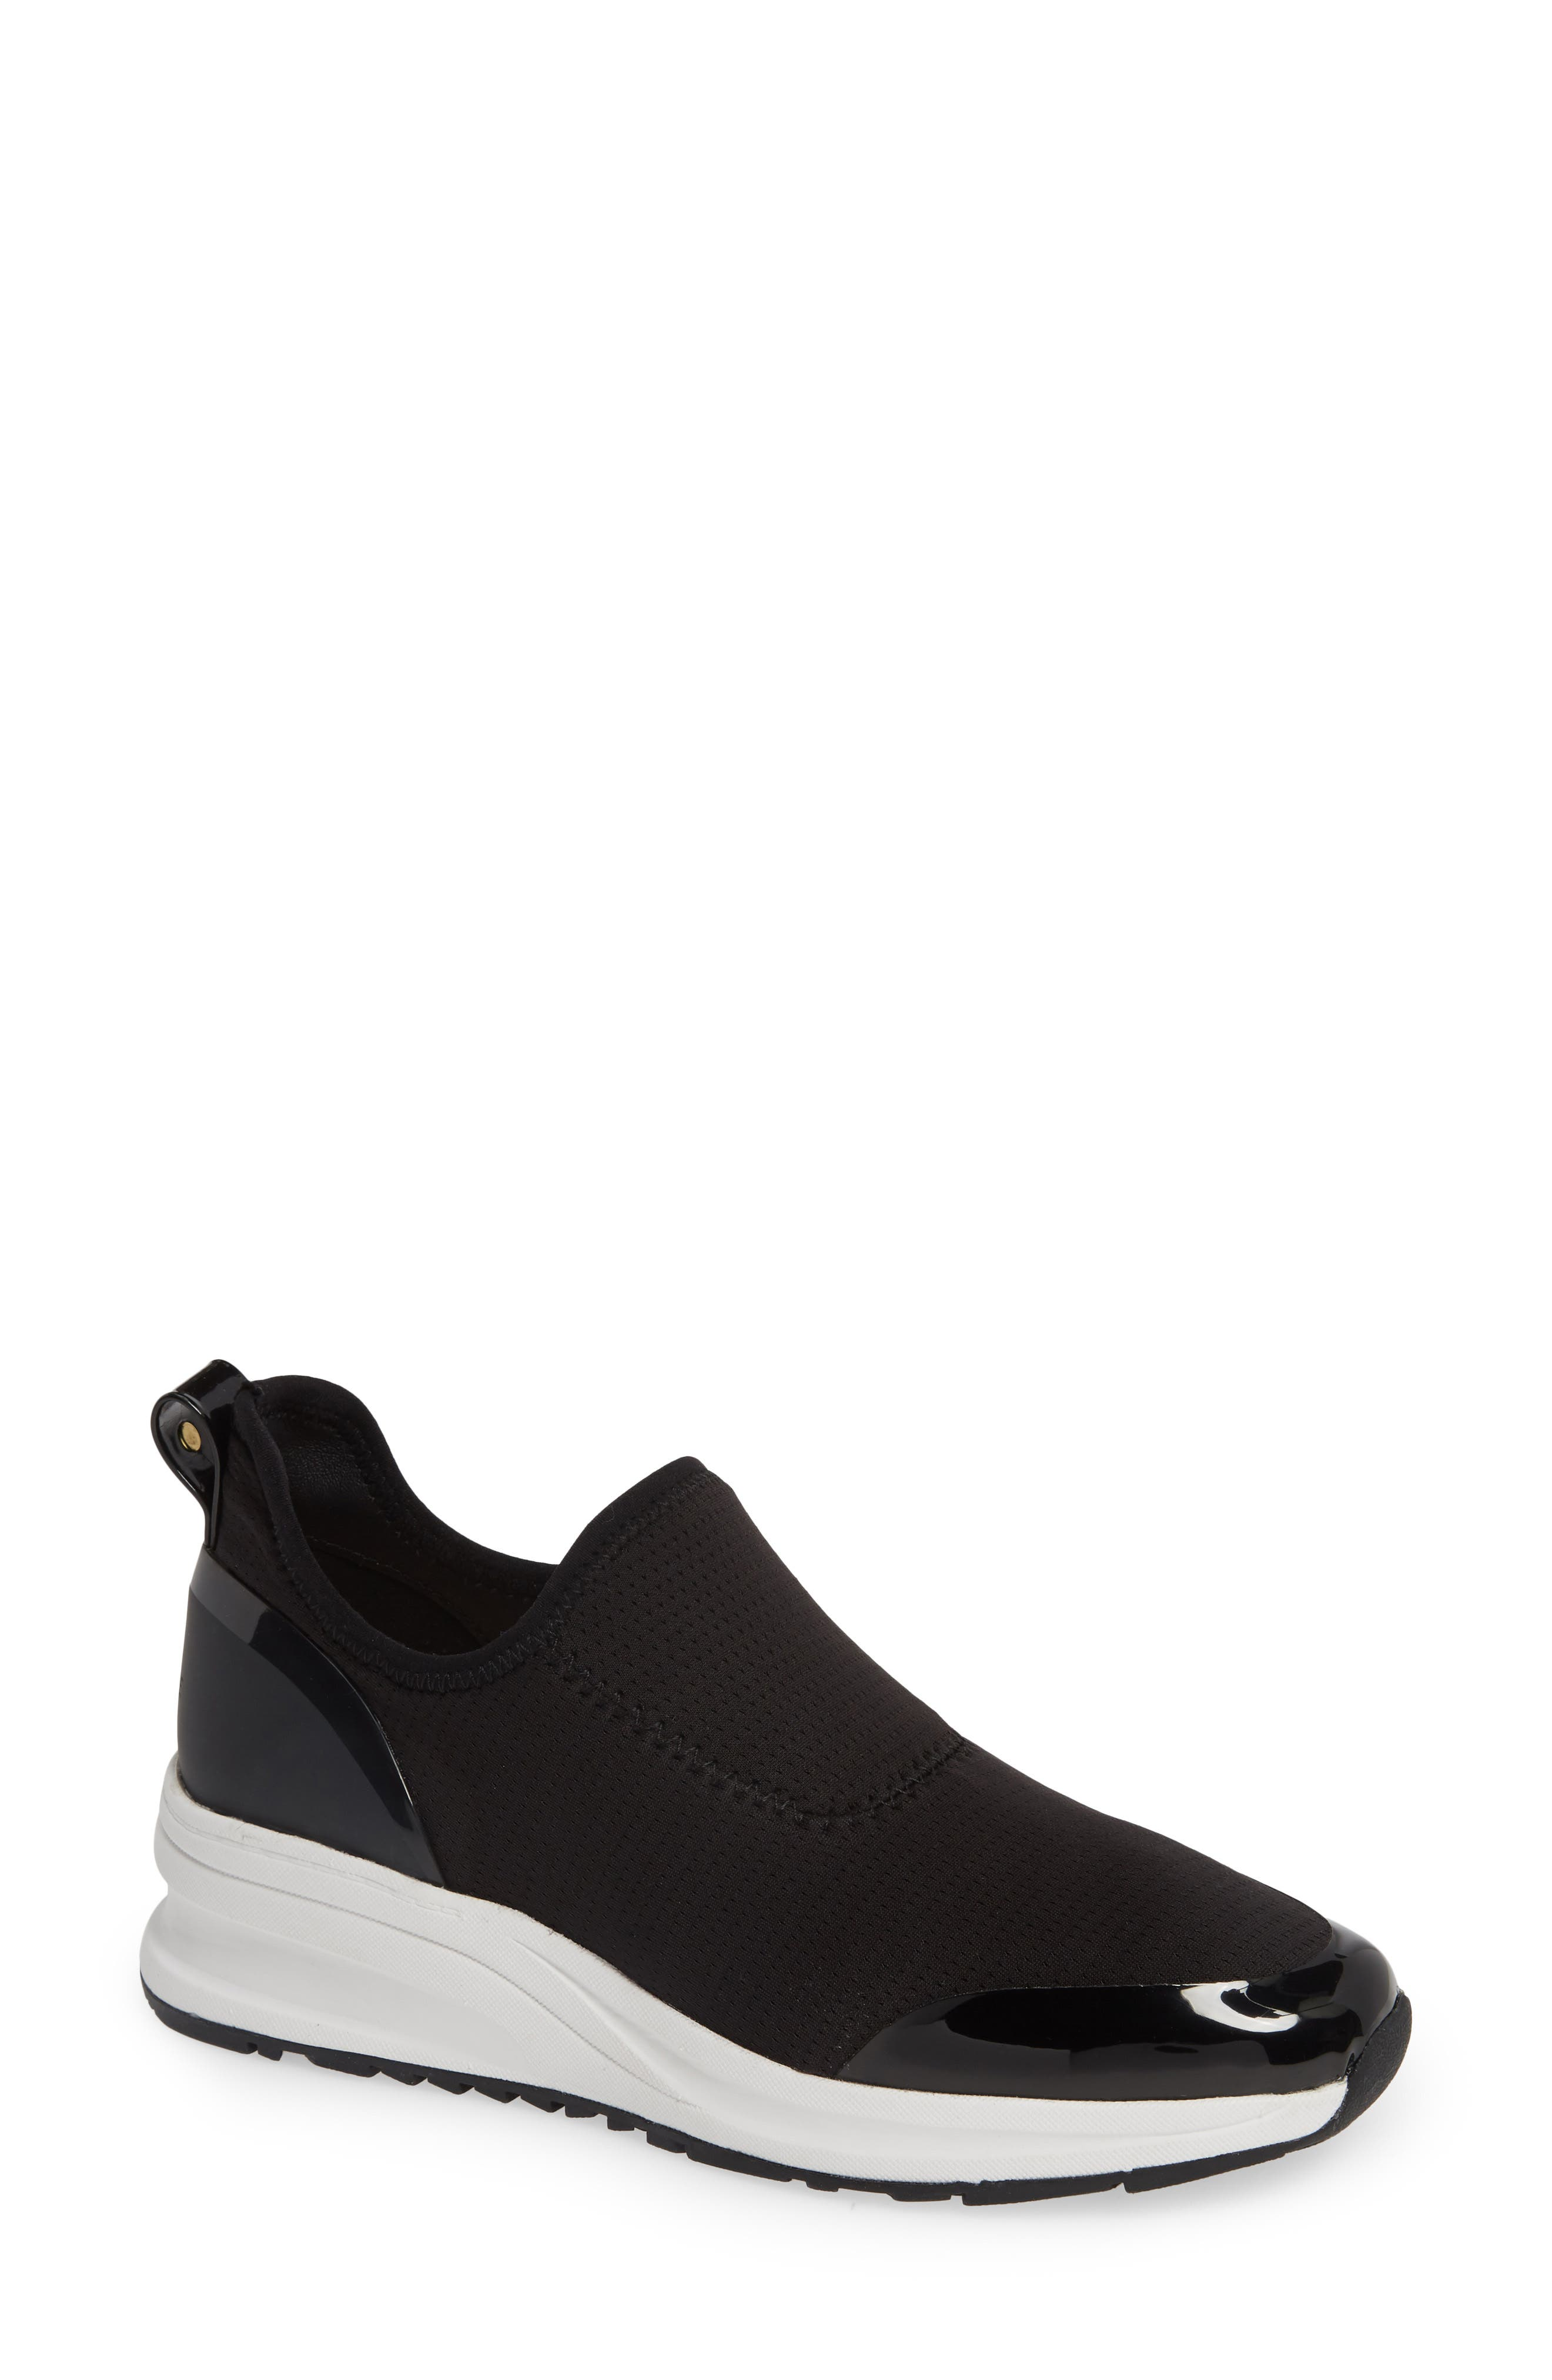 TARYN ROSE, Zabella Slip-On Sneaker, Main thumbnail 1, color, BLACK STRETCH FABRIC